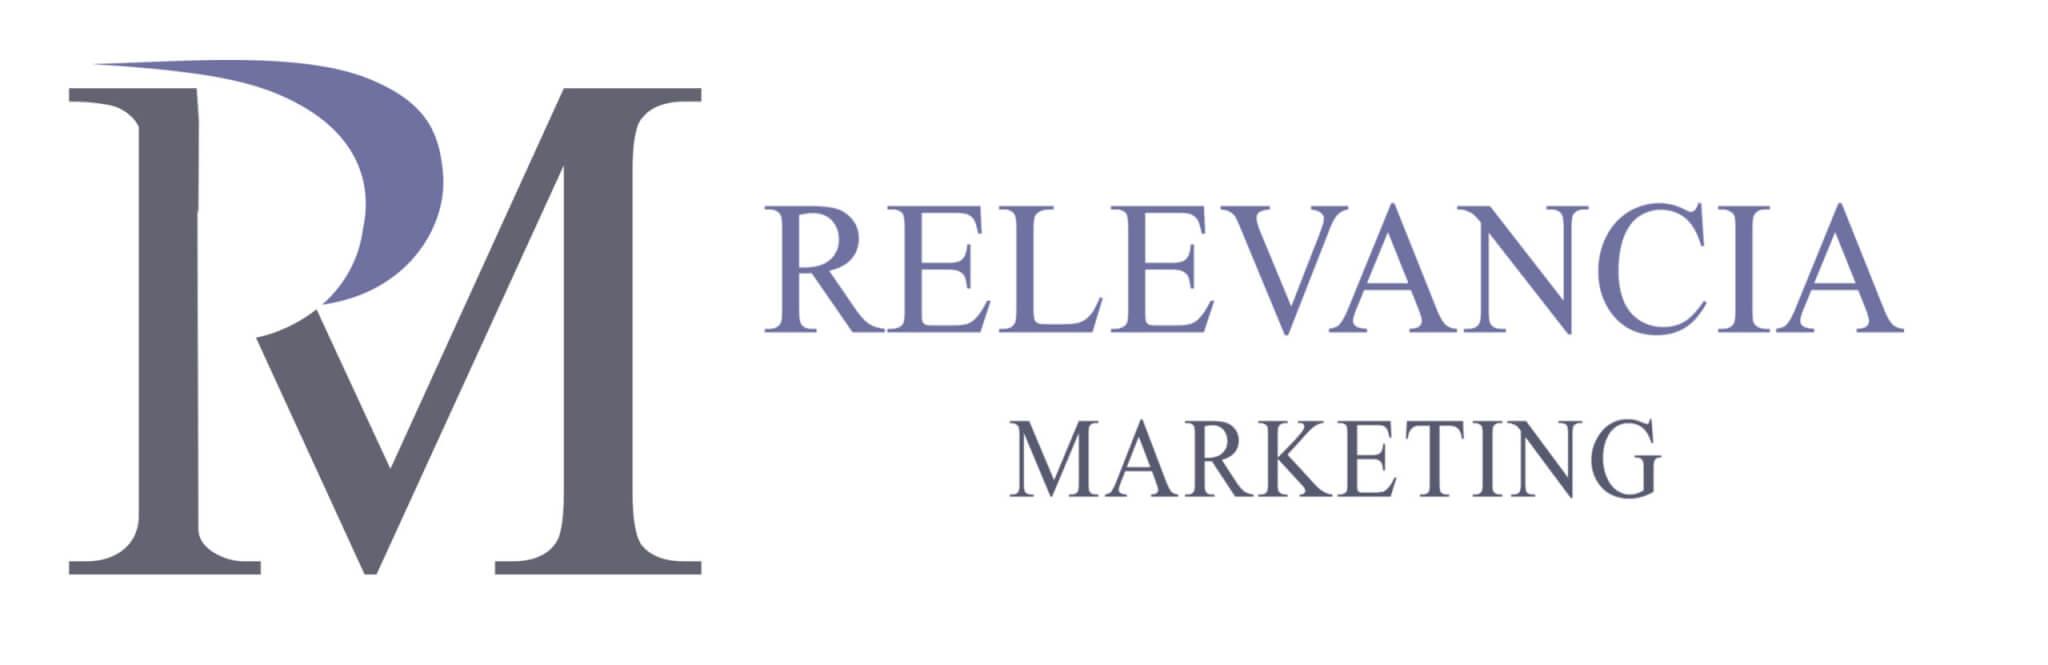 Relevancia Marketing